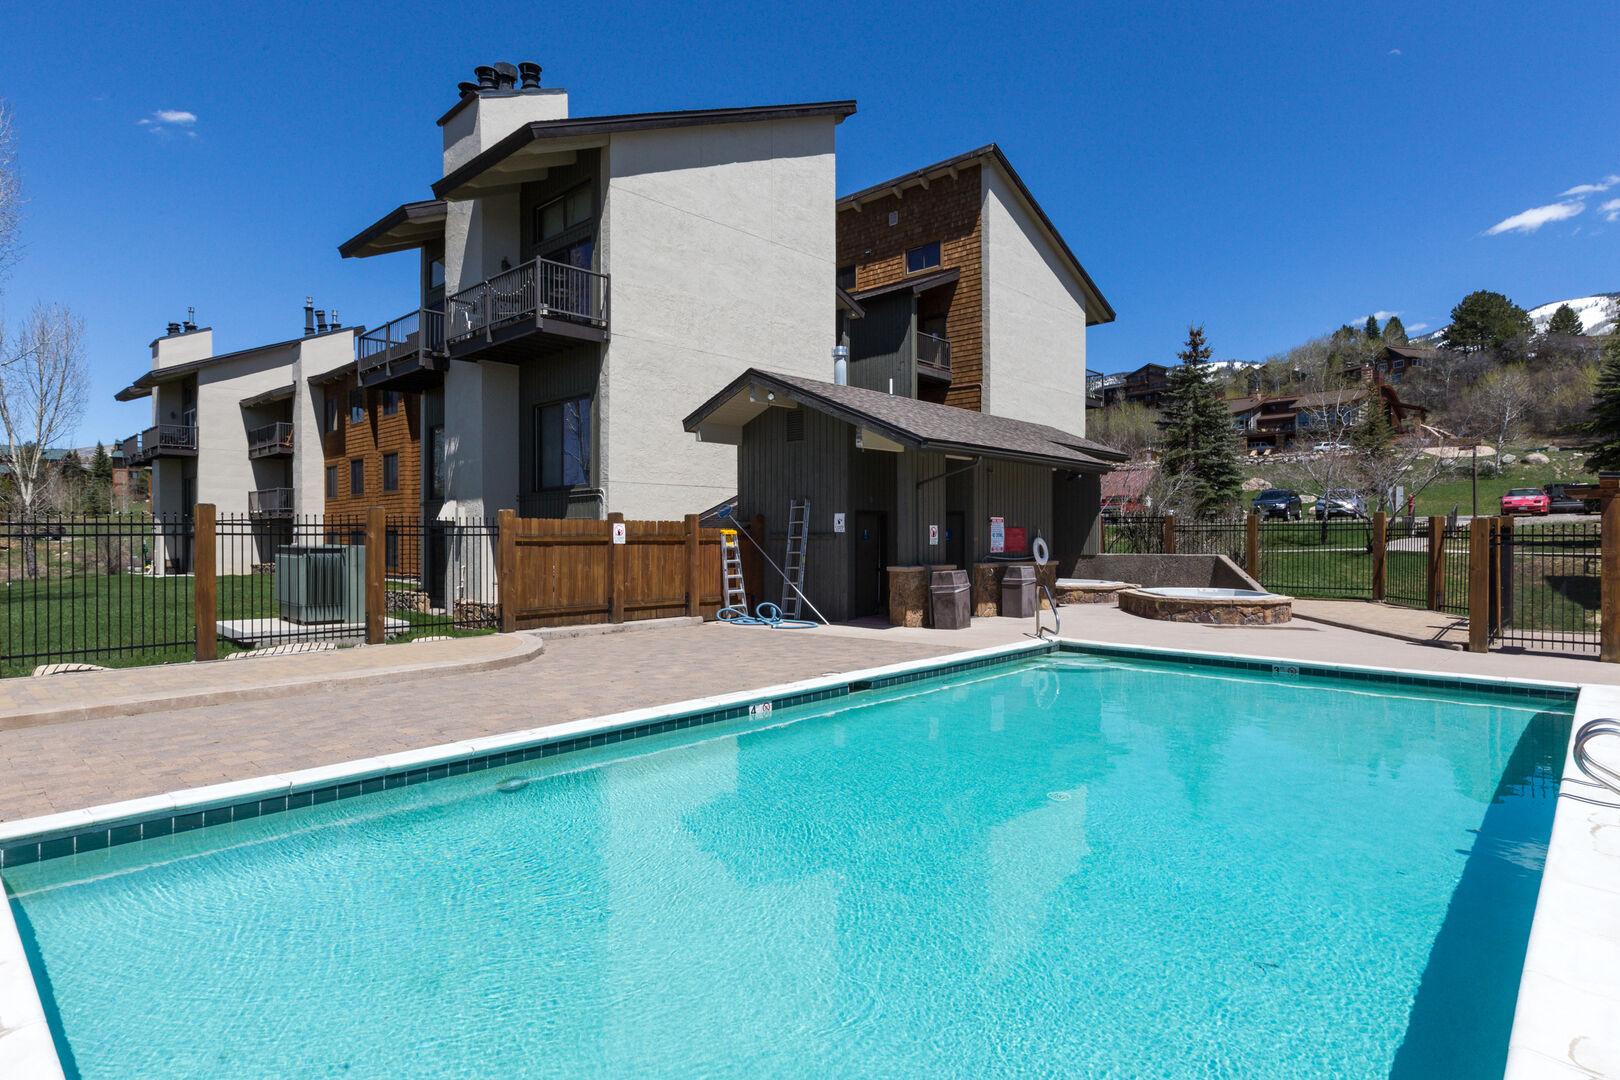 Community pool at The Rockies